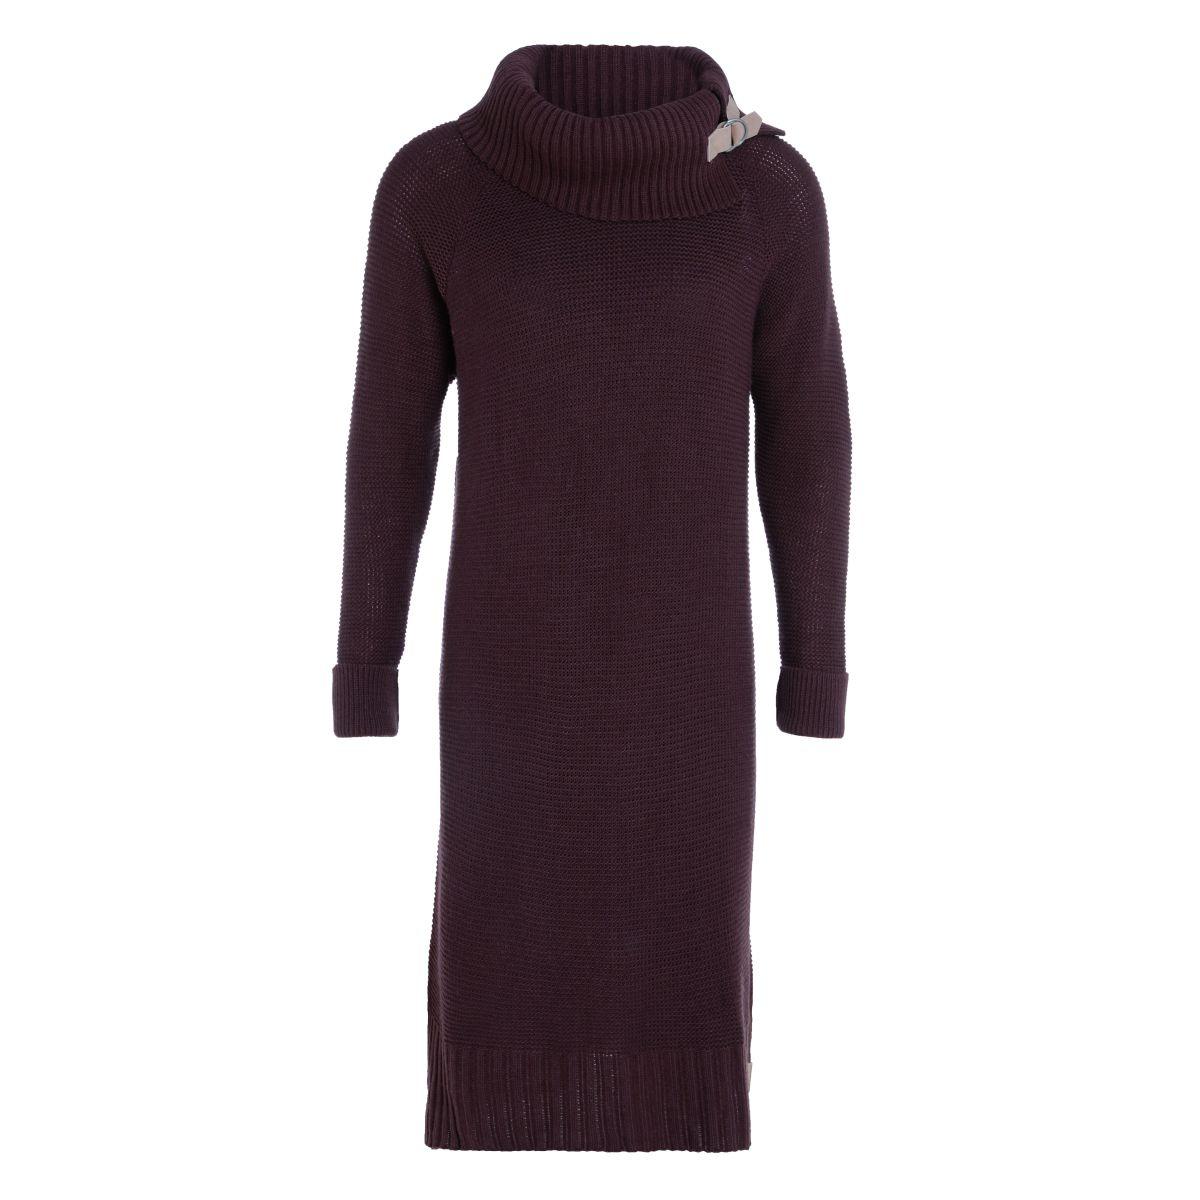 jamie gebreide jurk aubergine 4042